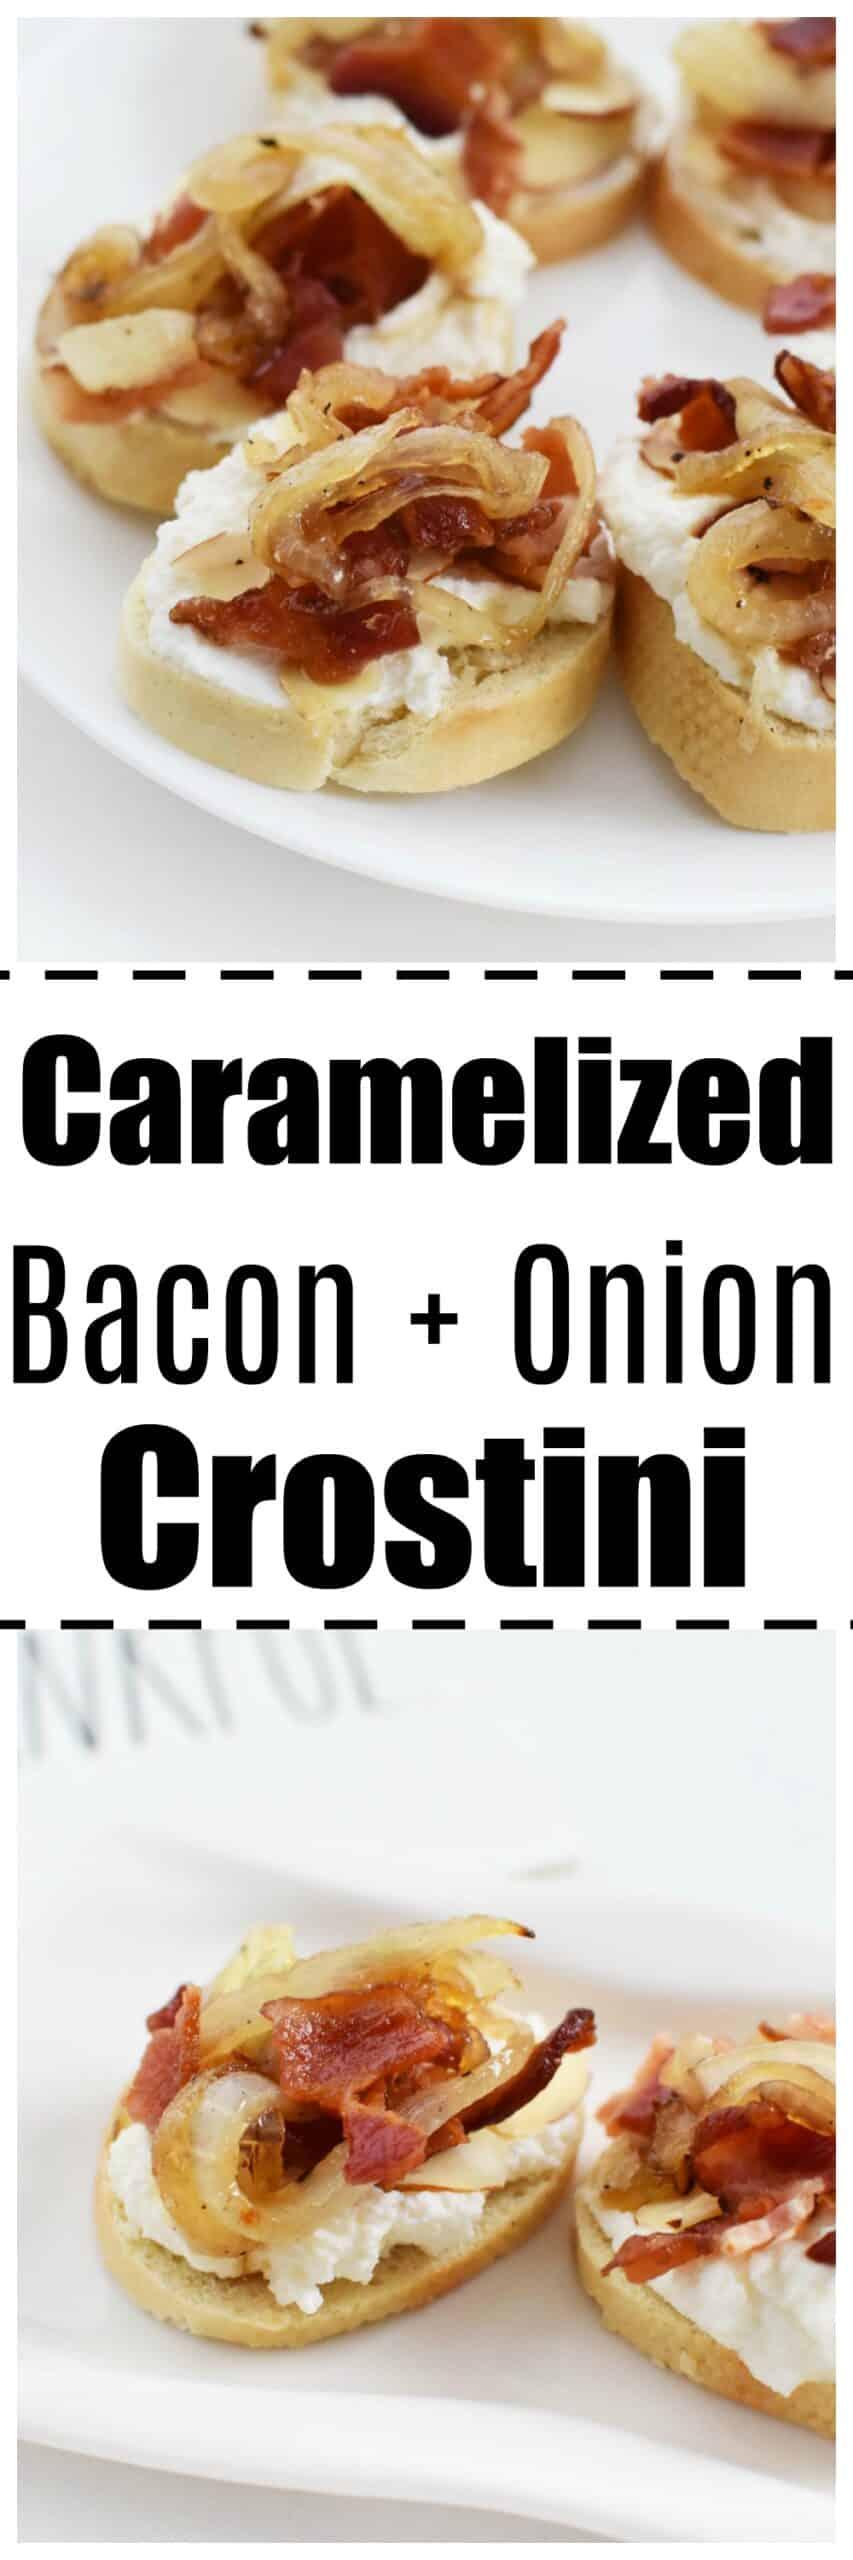 The Best Bacon Appetizer Recipe (Bacon & Onion Crostini)